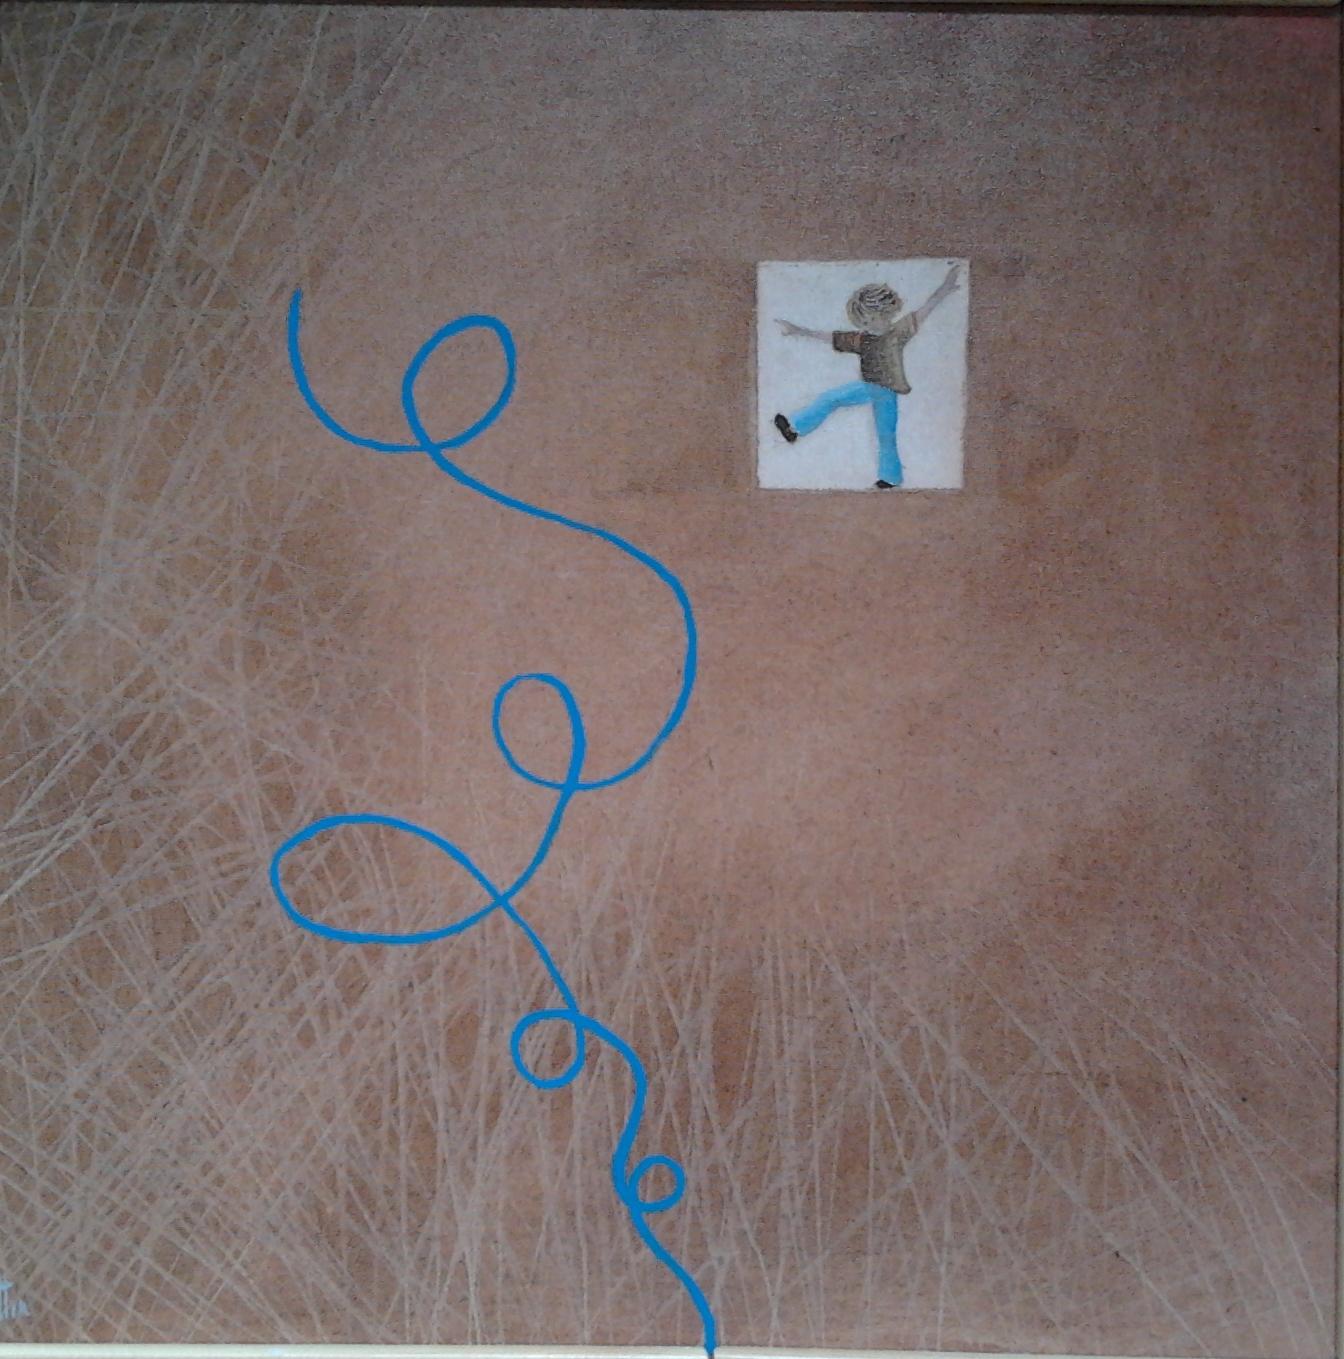 Sto arrivando! tecnica mista su tela 40x40 cm - 2012